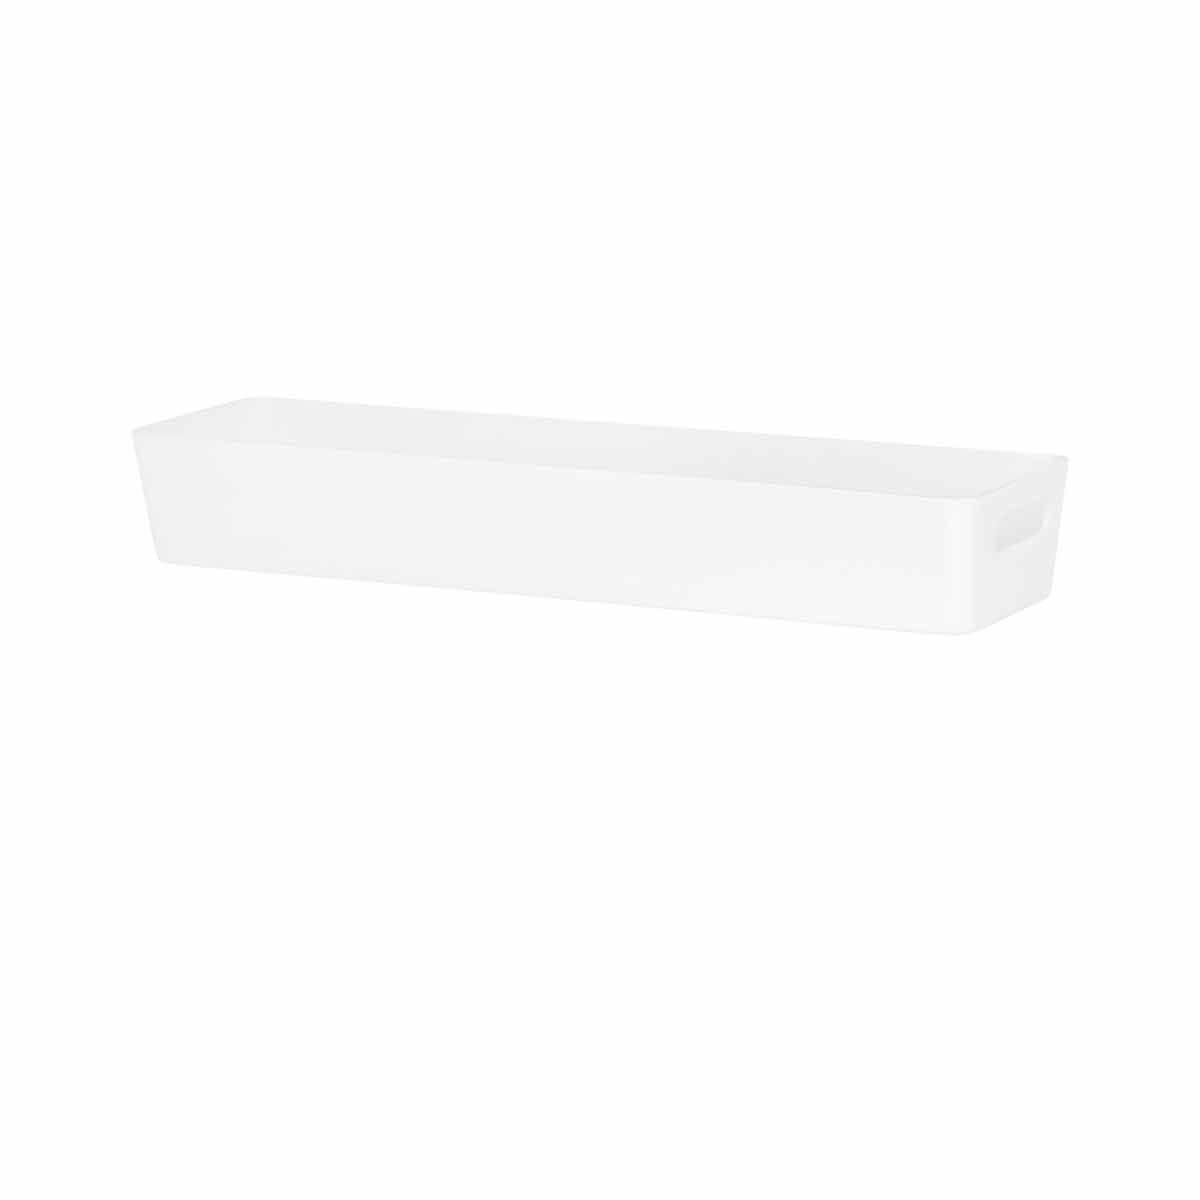 Wham Studio Rectangular Basket 12.01 White